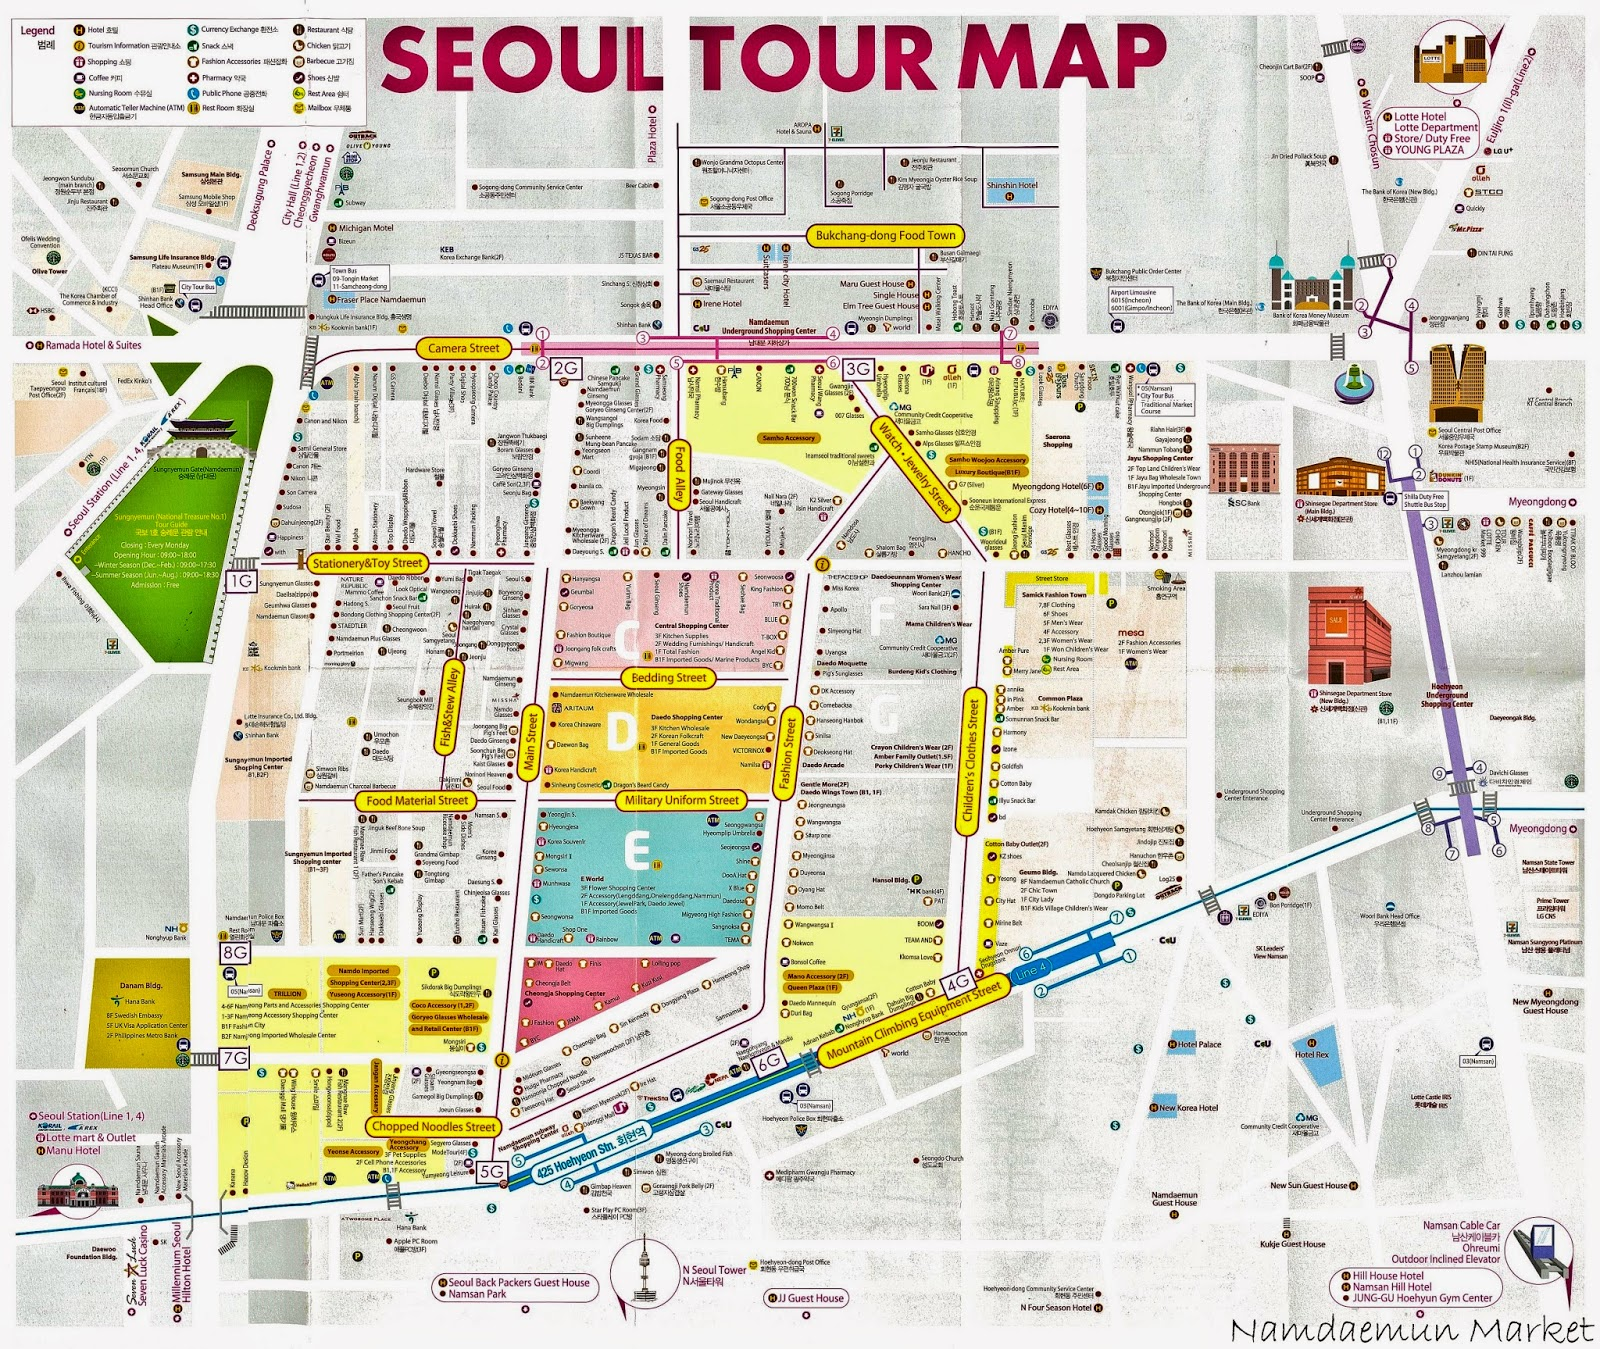 entree kibbles namdaemun market (남대문시장)  korea largest  - entree kibbles namdaemun market (남대문시장)  korea largest traditionalmarket  seoul line   hoehyeon station